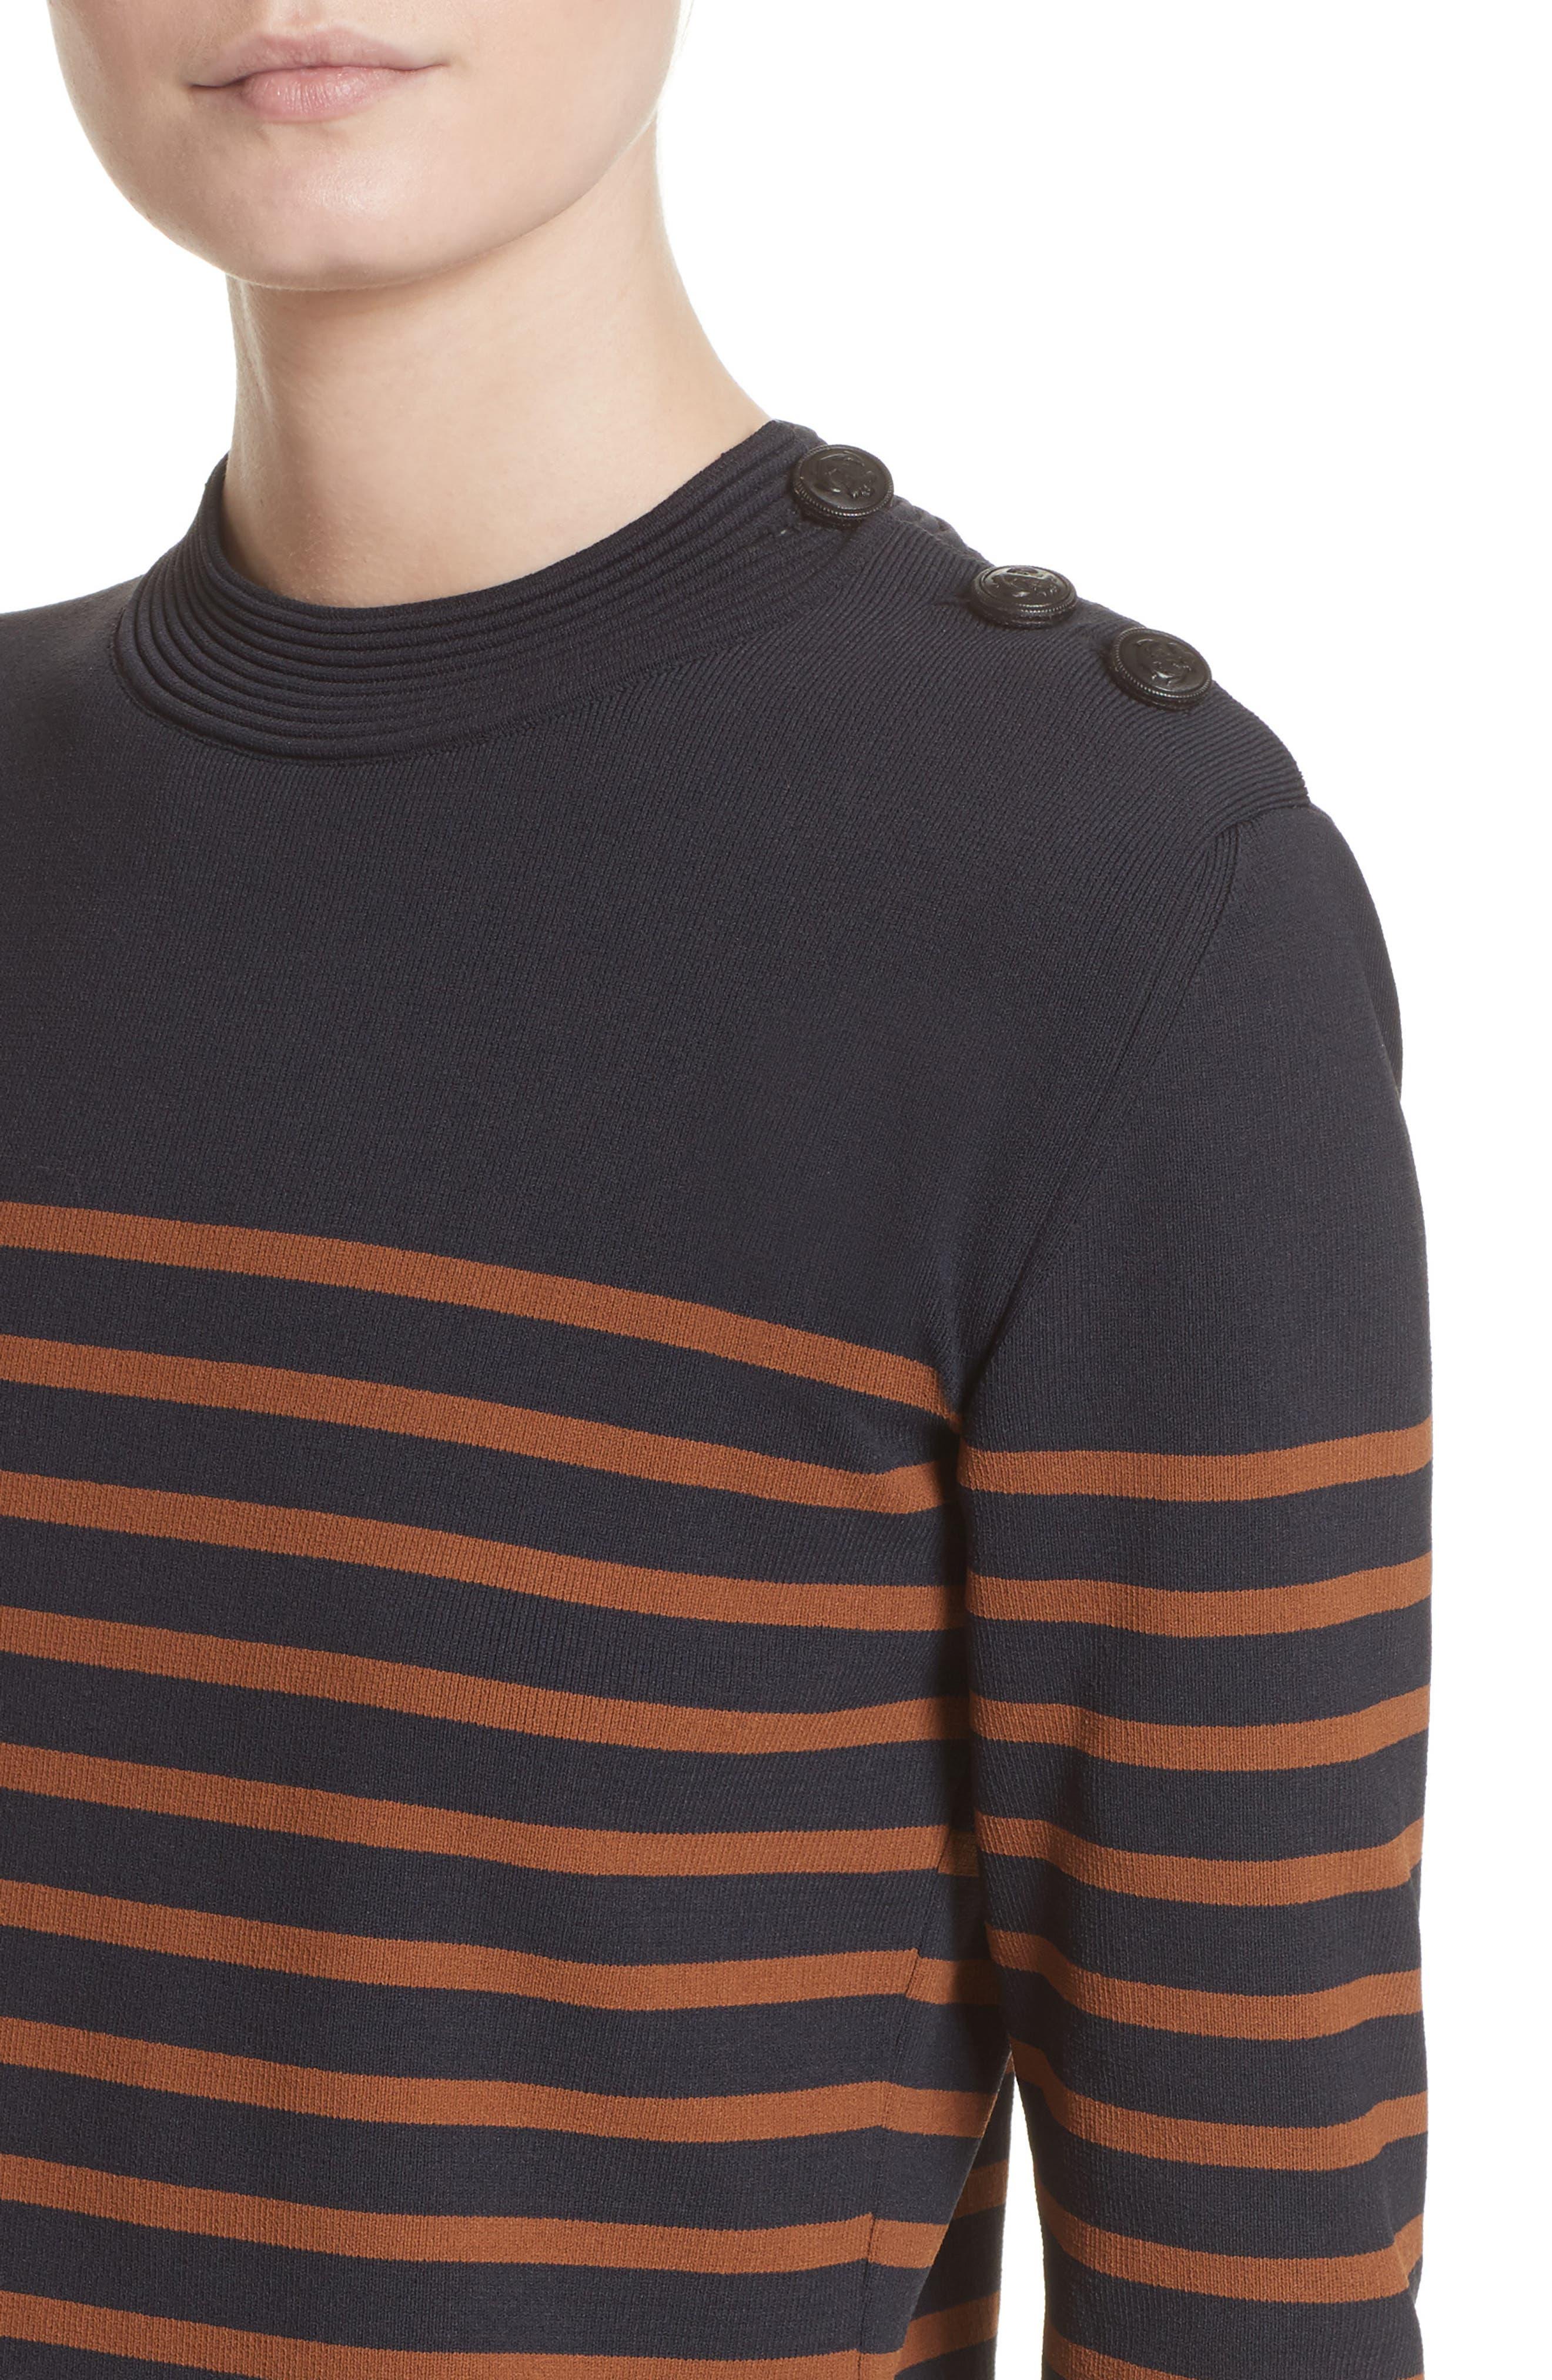 Selicia Stripe Sweater,                             Alternate thumbnail 6, color,                             Black